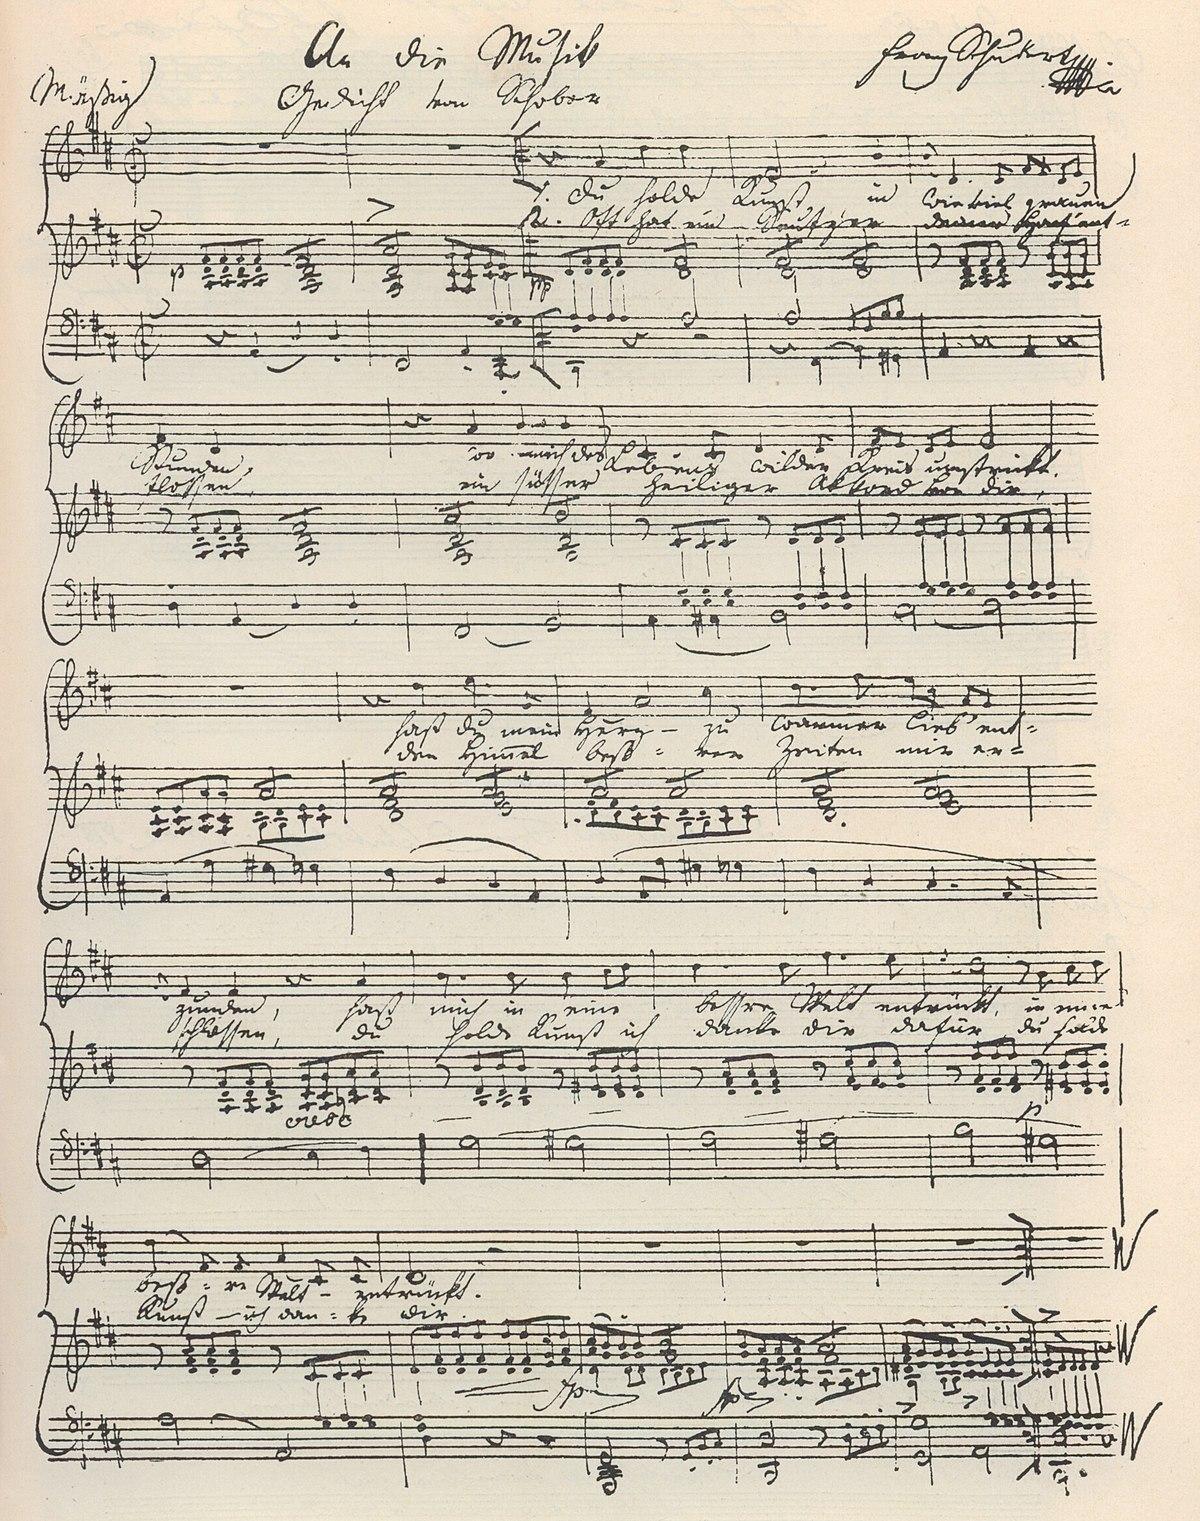 an die musik - wikipedia  wikipedia